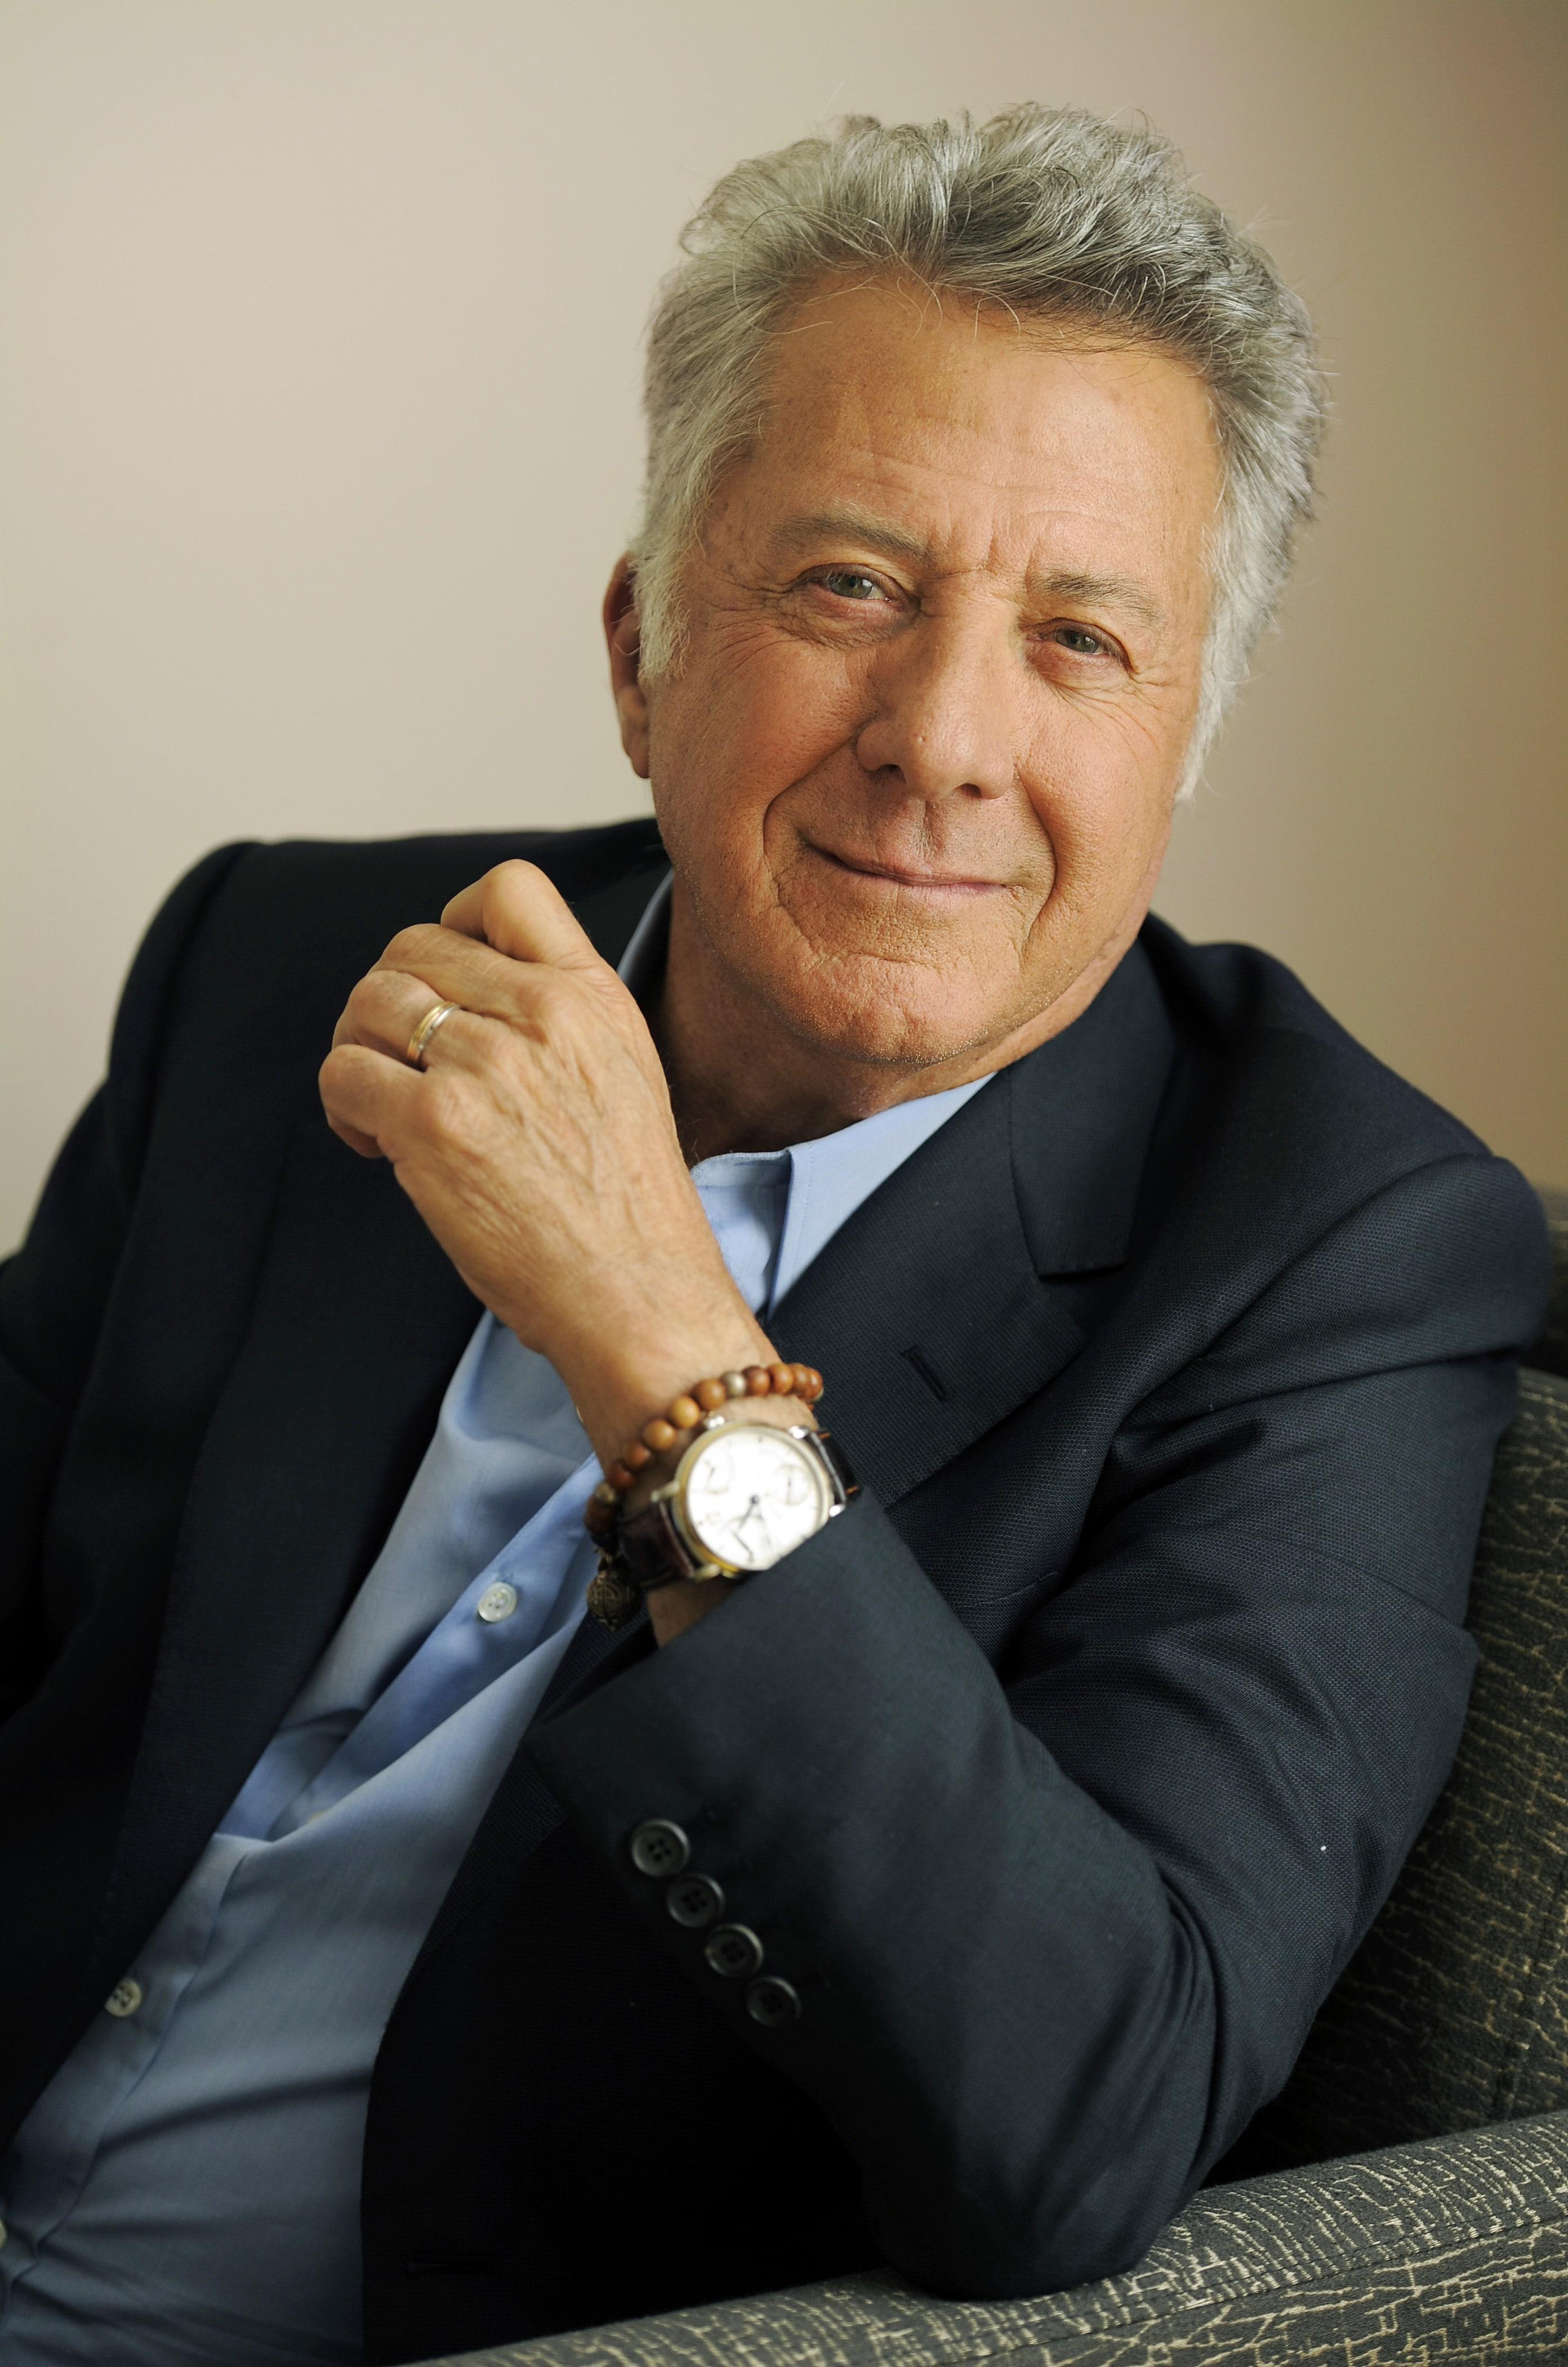 Dustin Hoffman Background